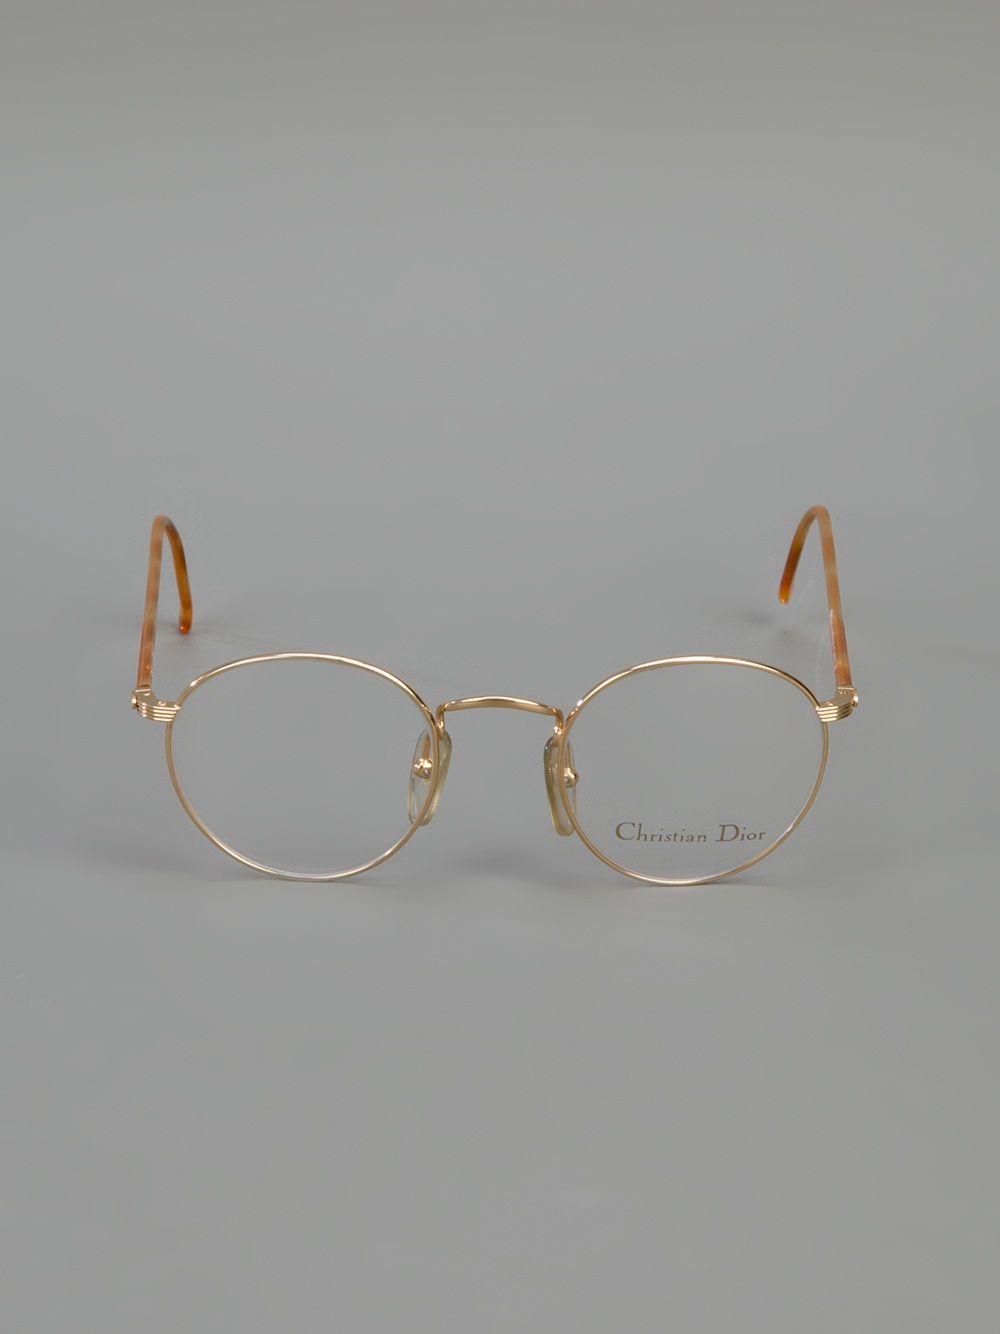 Glasses Frame Dior : CHRISTIAN DIOR VINTAGE round frame glasses glasses ...